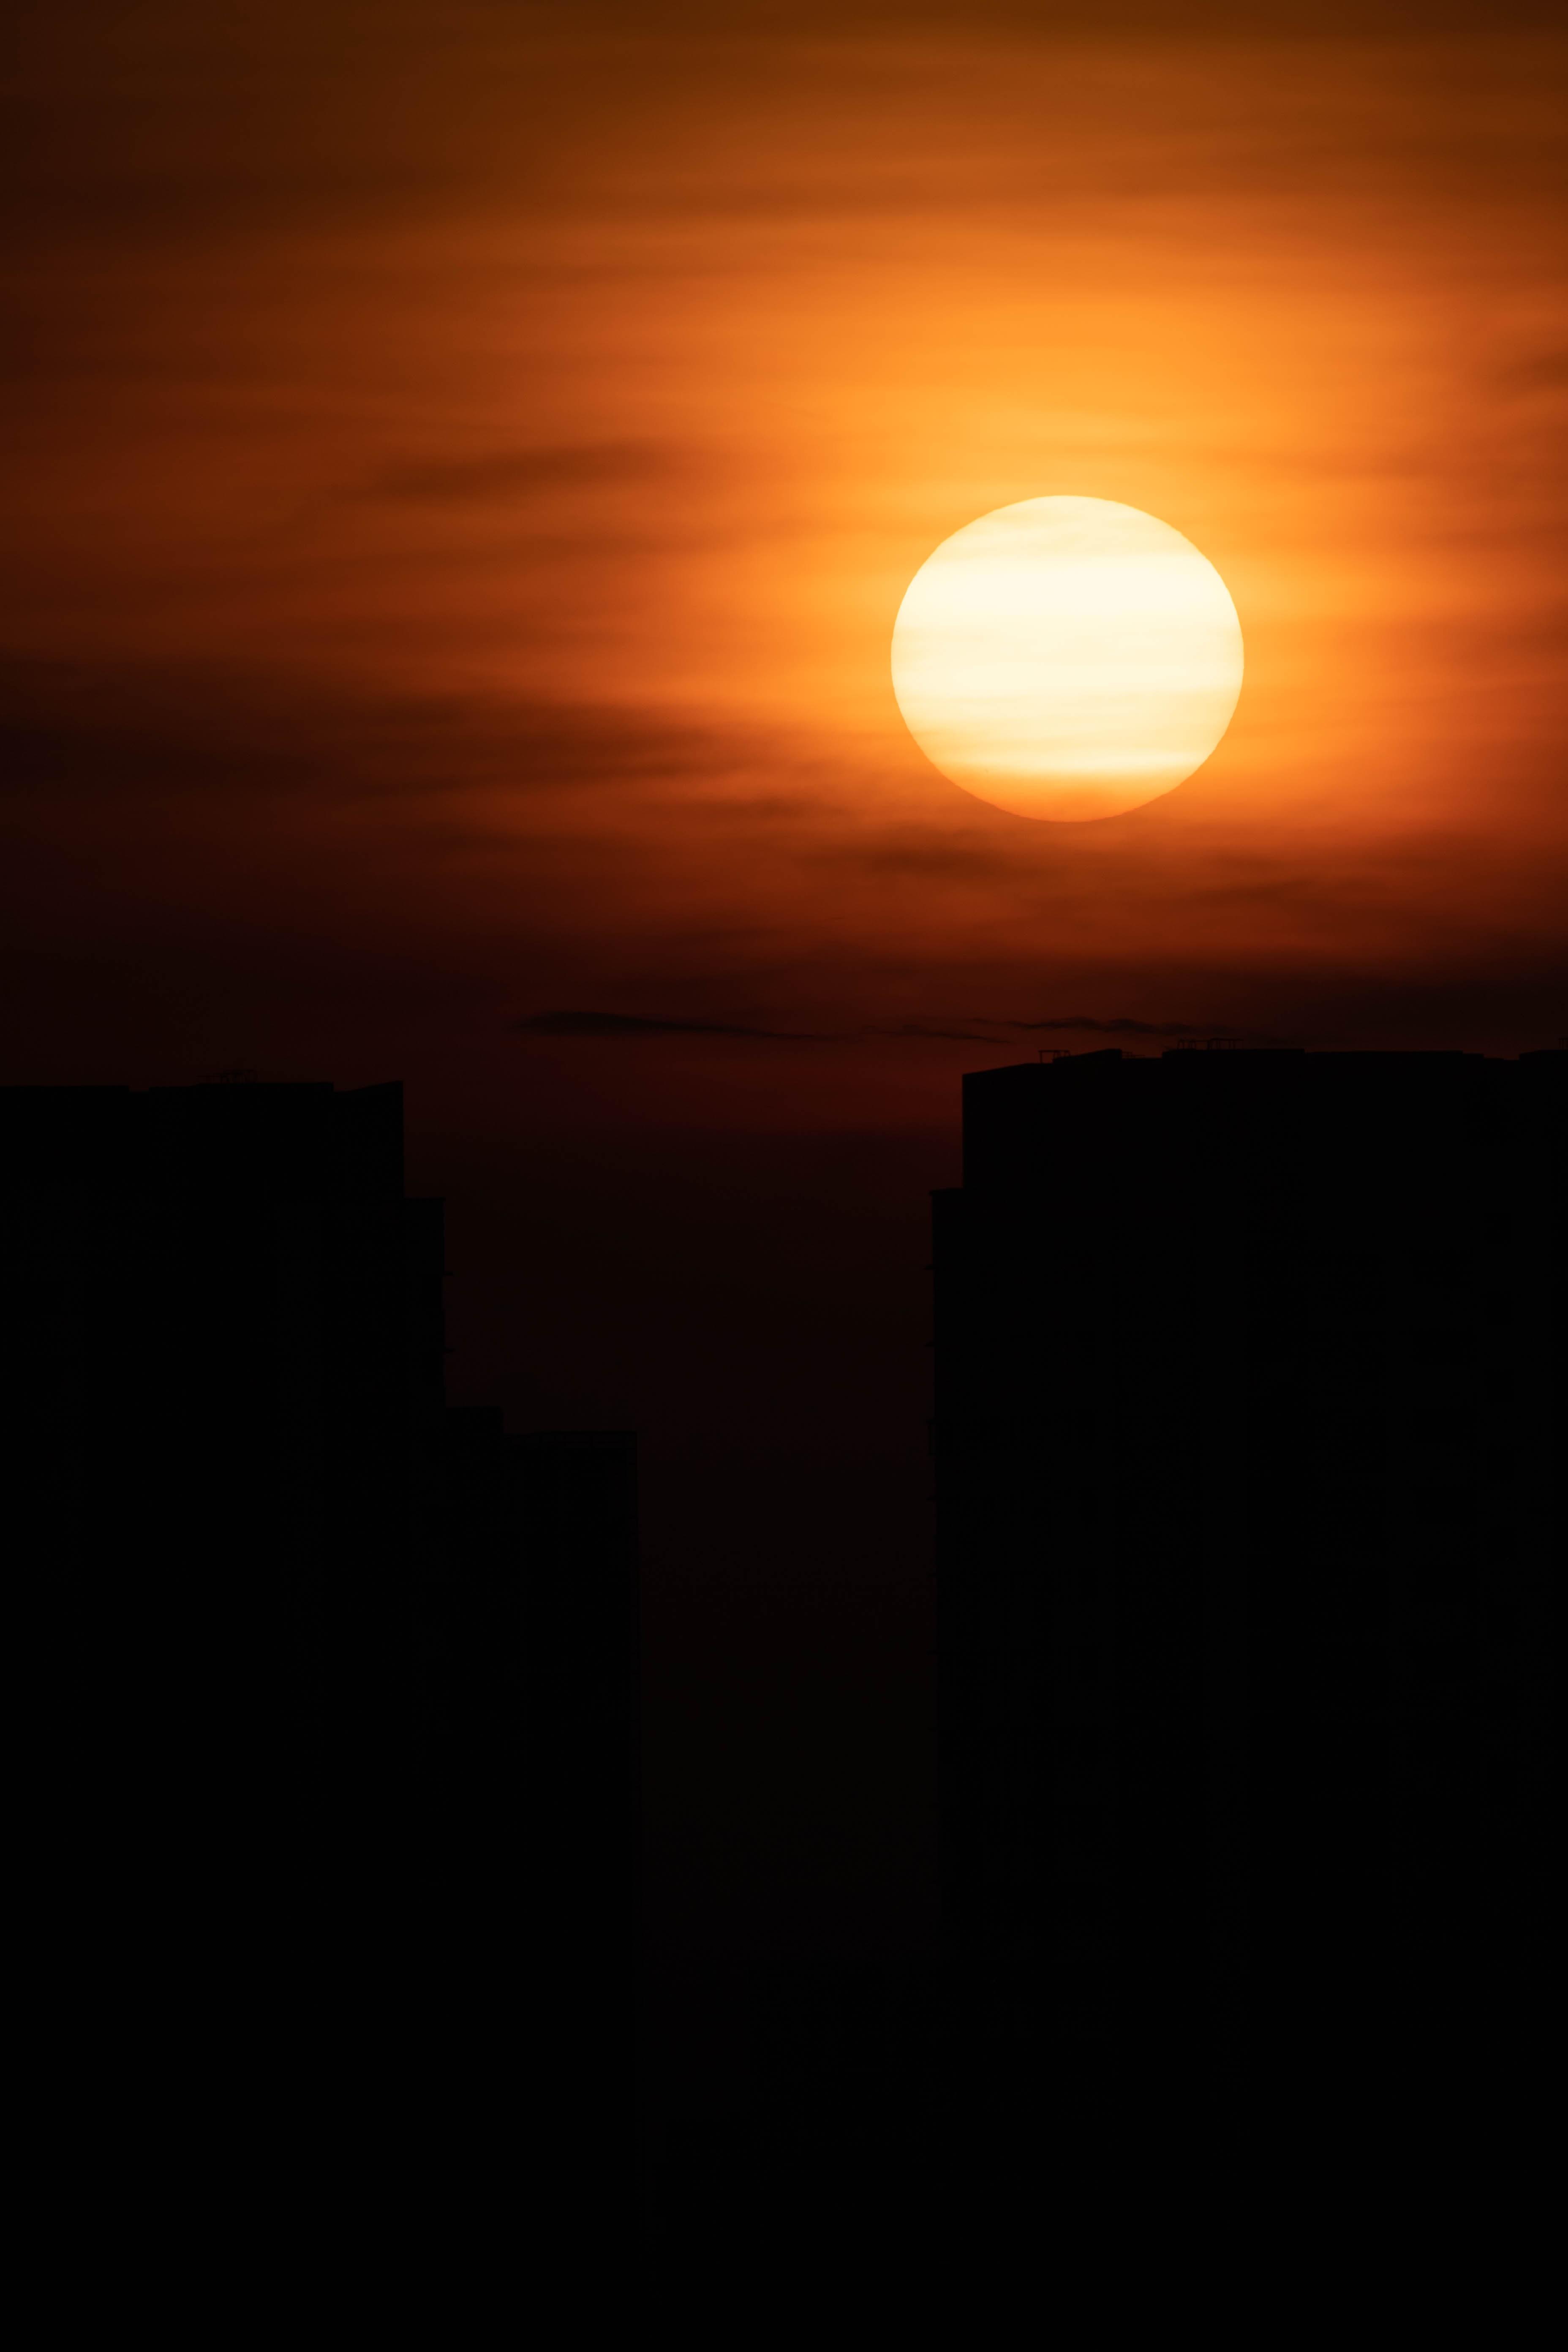 sun during golden hour